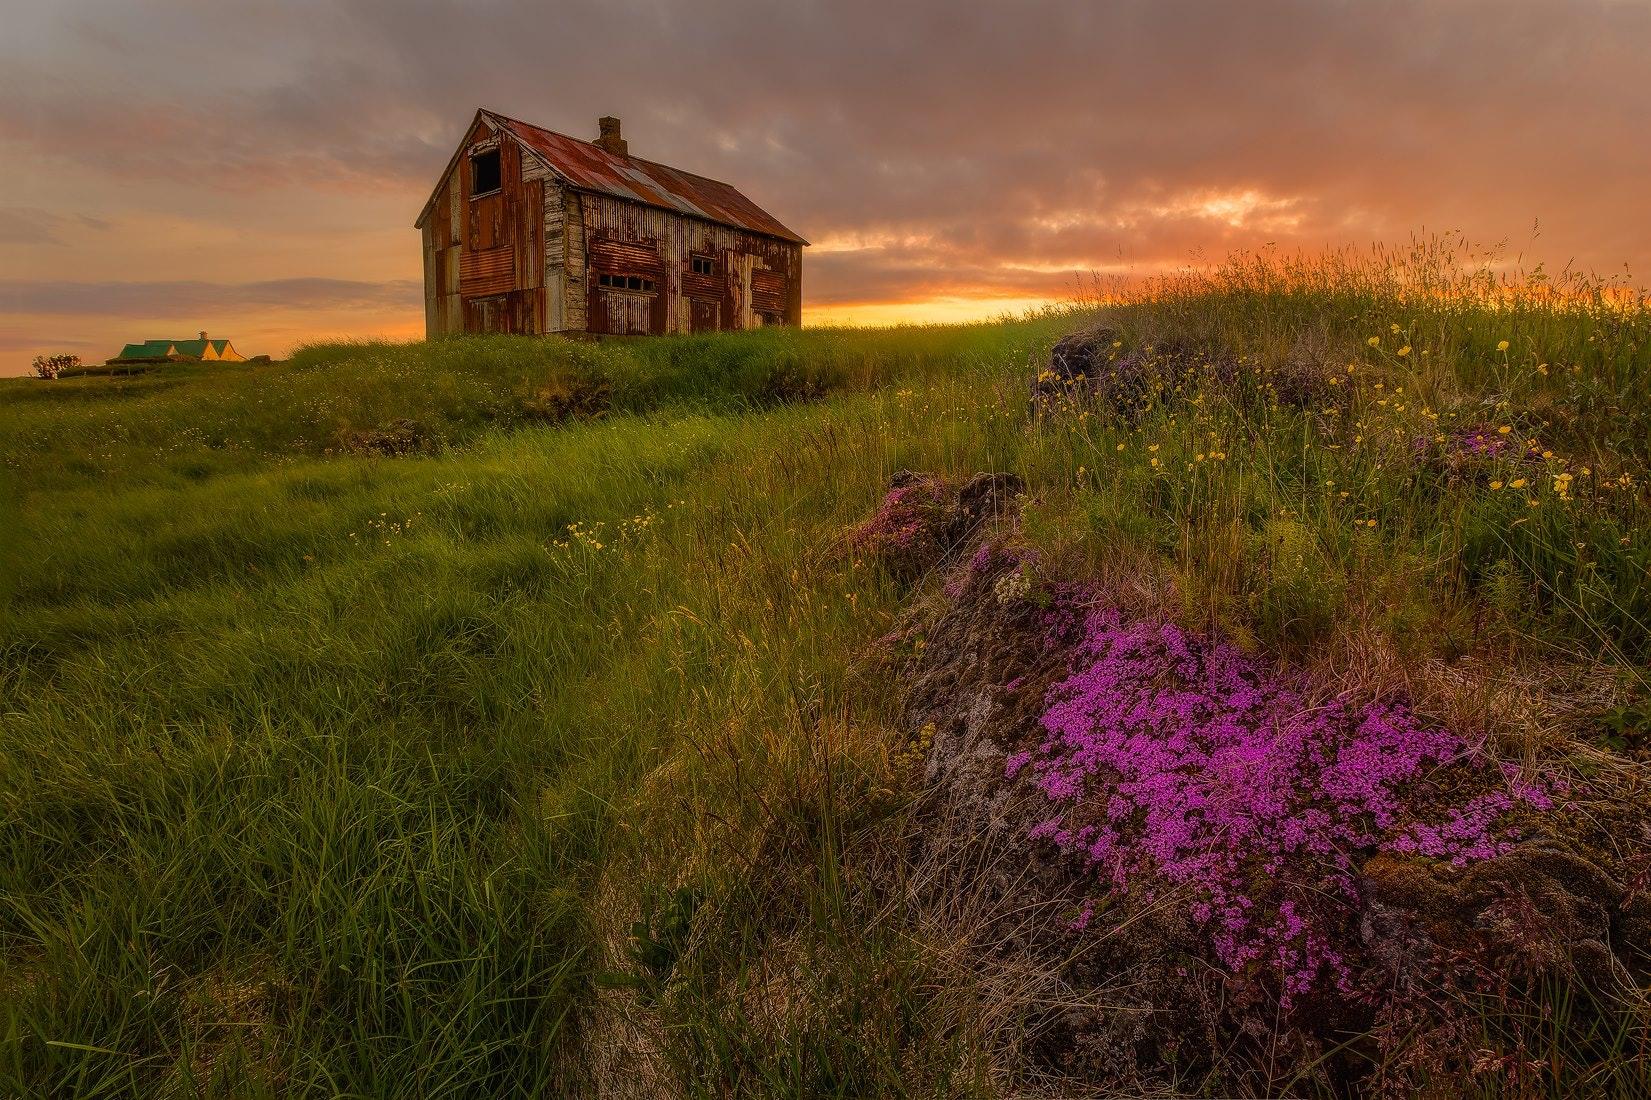 countryside of Reykjavik Iceland